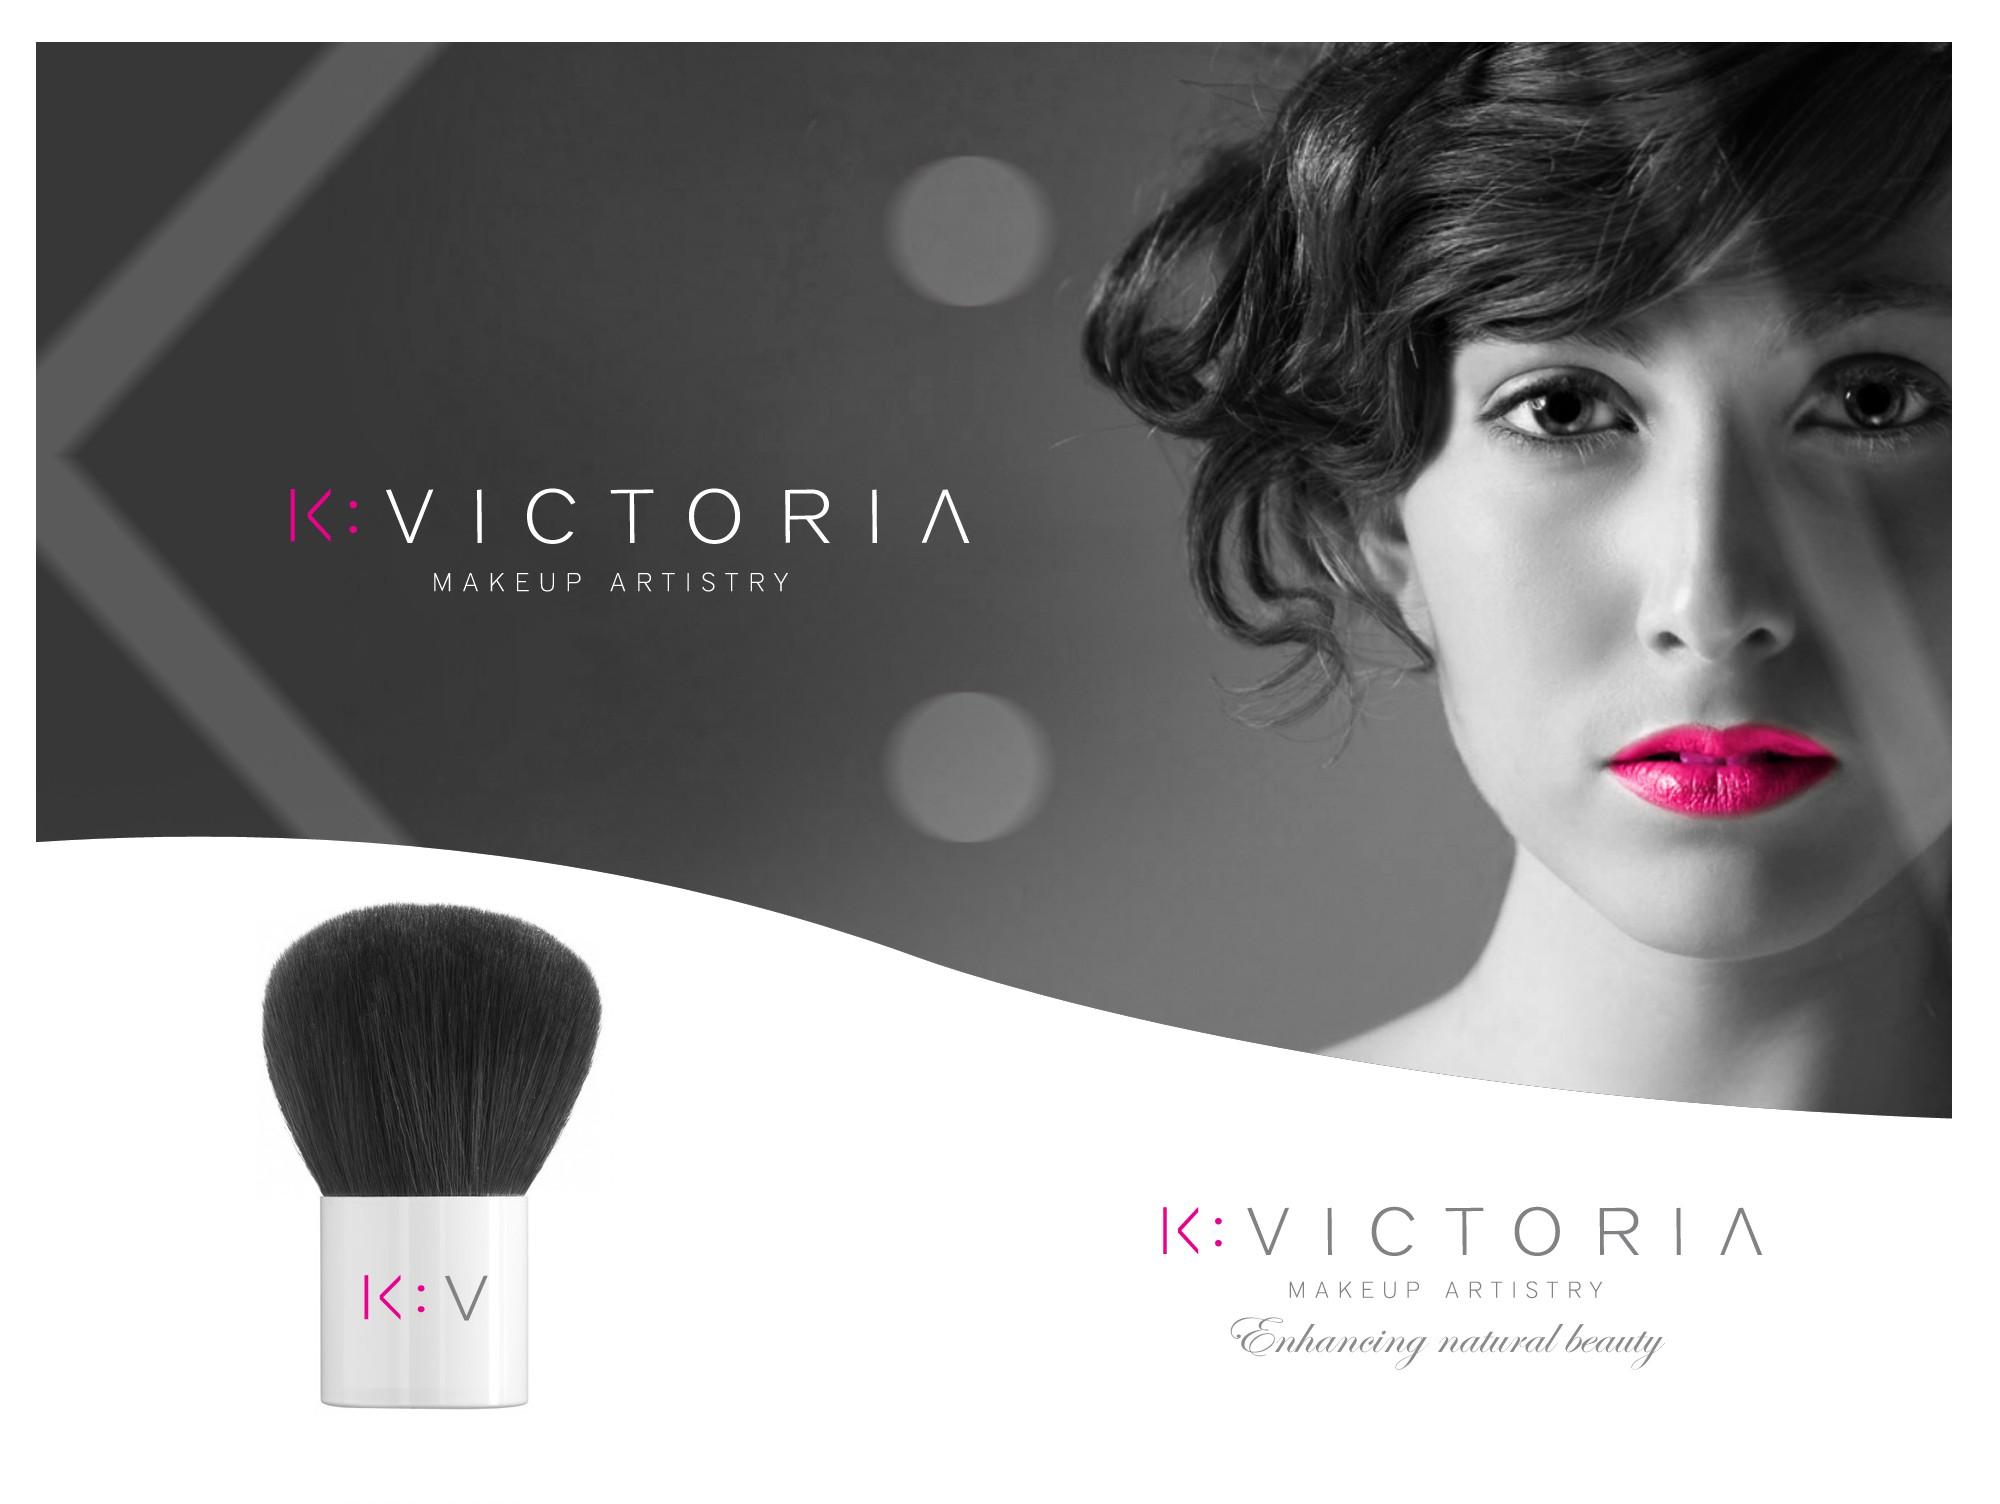 K Victoria Makeup Artistry needs a new logo